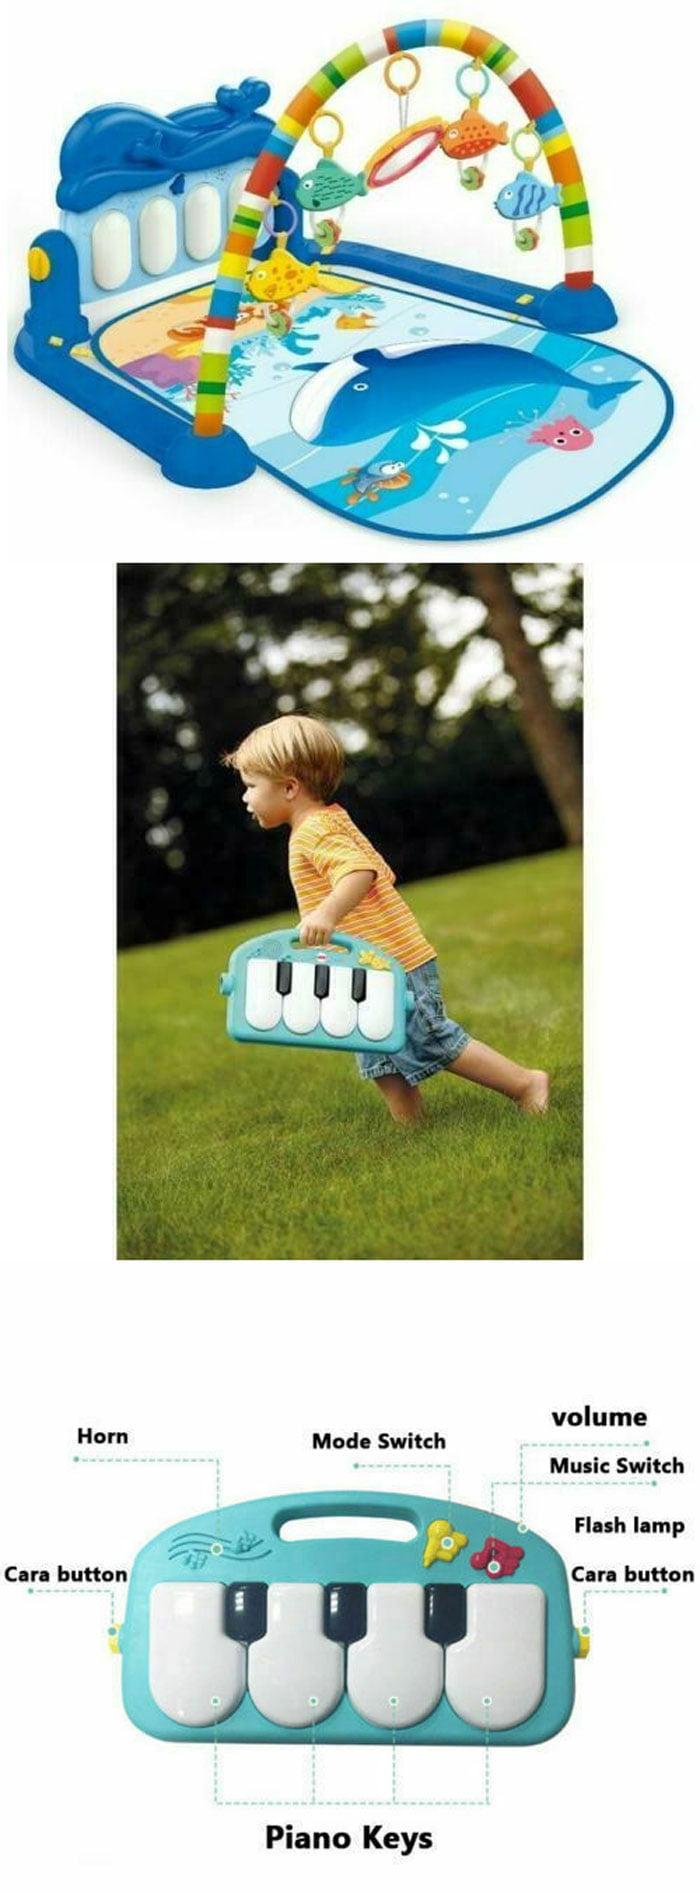 Huanger Playmat Kick 'n' Play Newborn Baby Playmat, Play Gym, Musical Activity Gym 0-36 Month